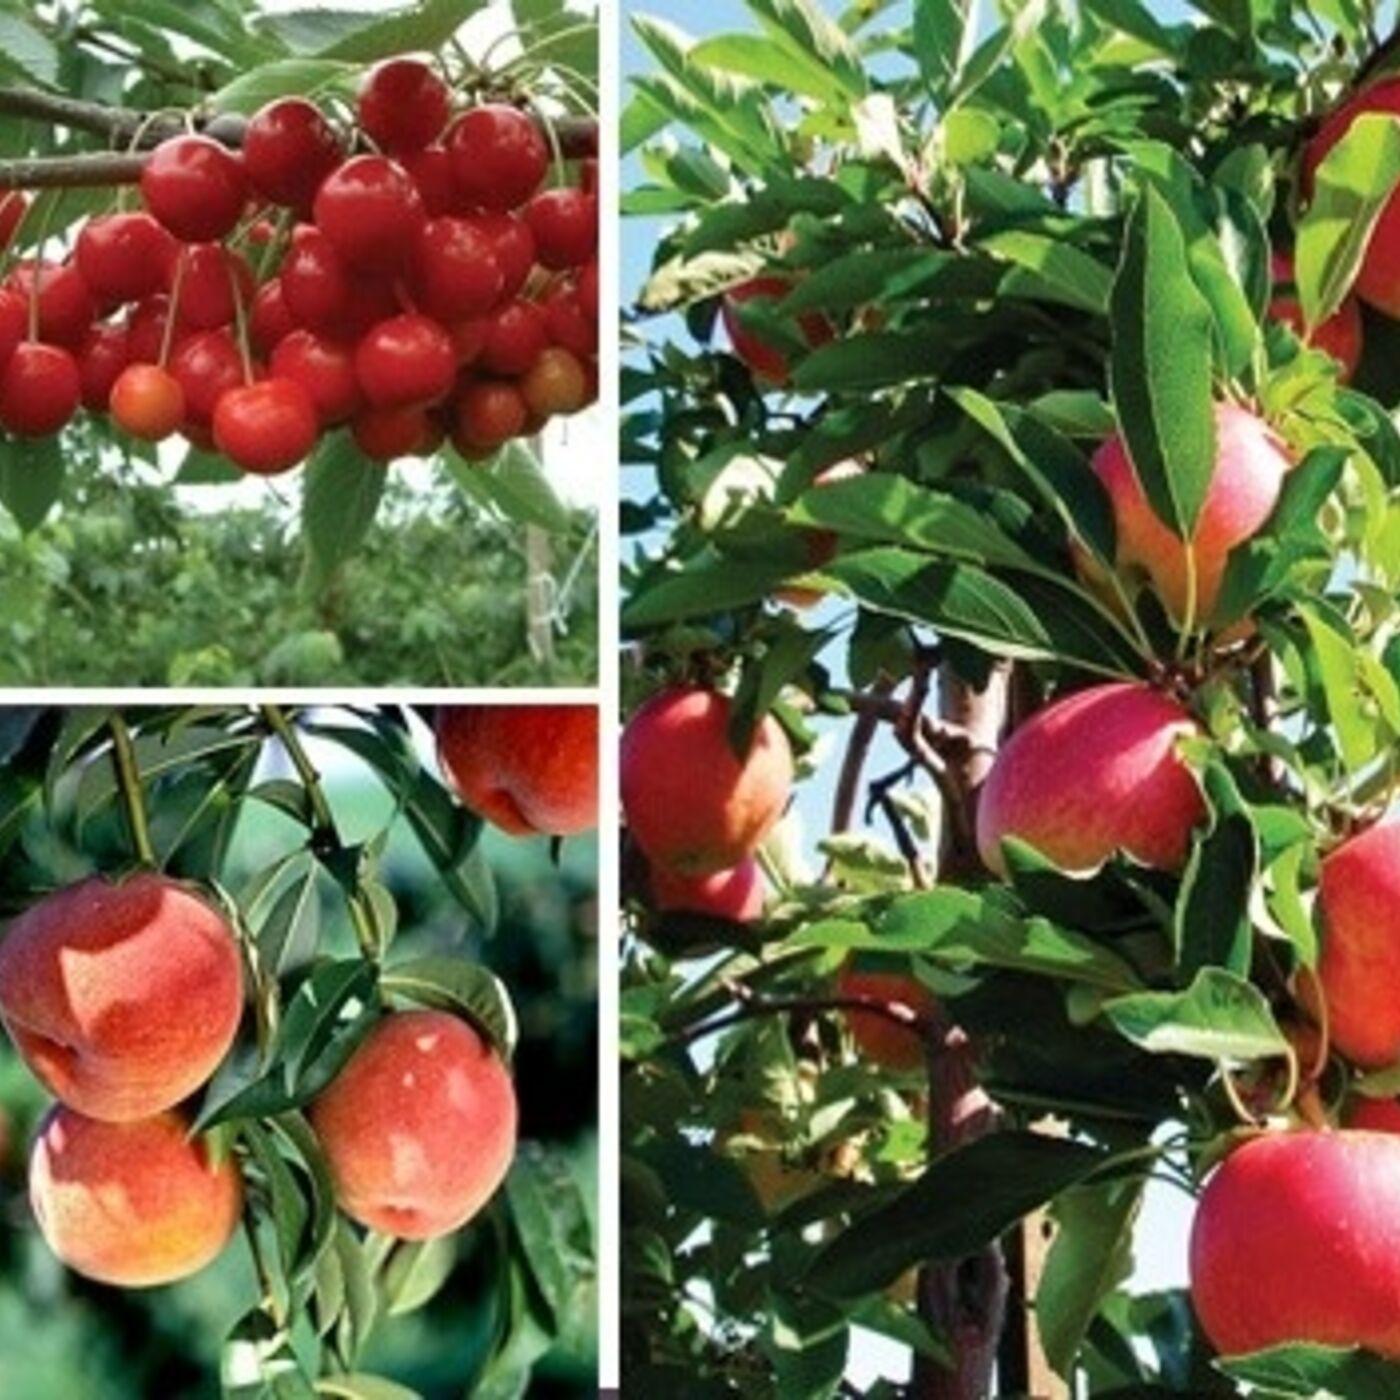 Fruit Trees with Greg Gayton